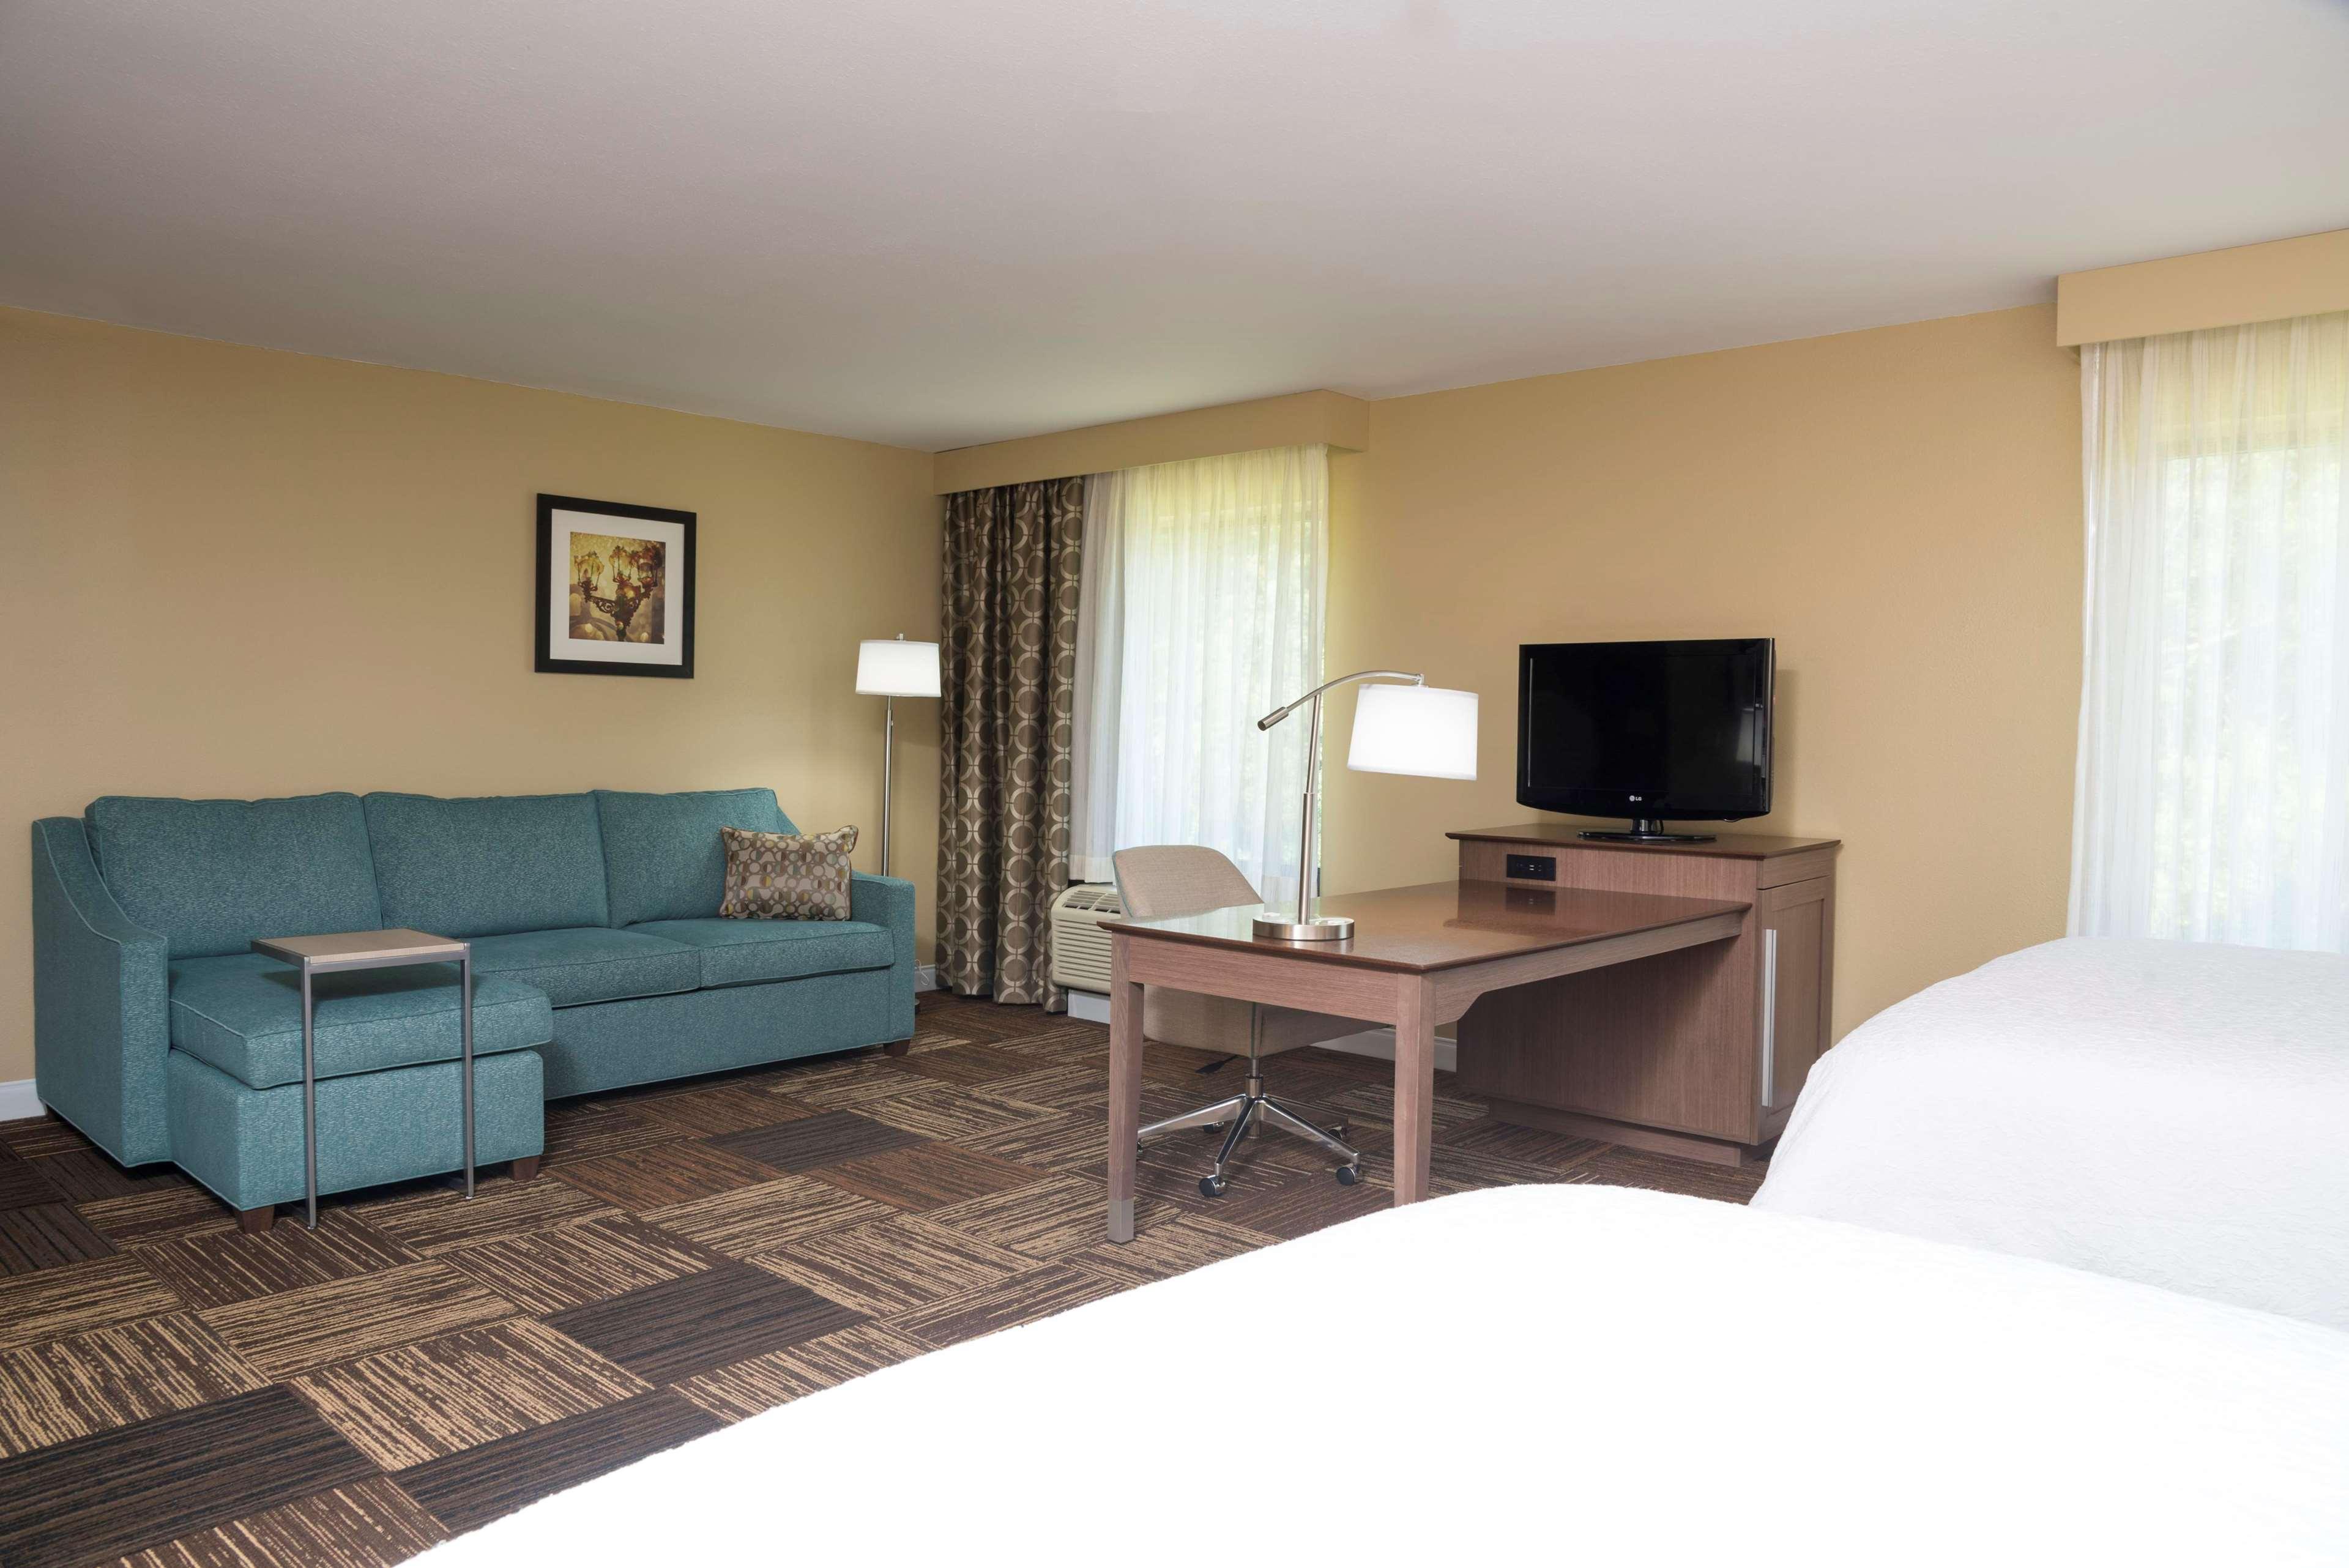 Hampton Inn & Suites Mansfield-South @ I-71 image 32